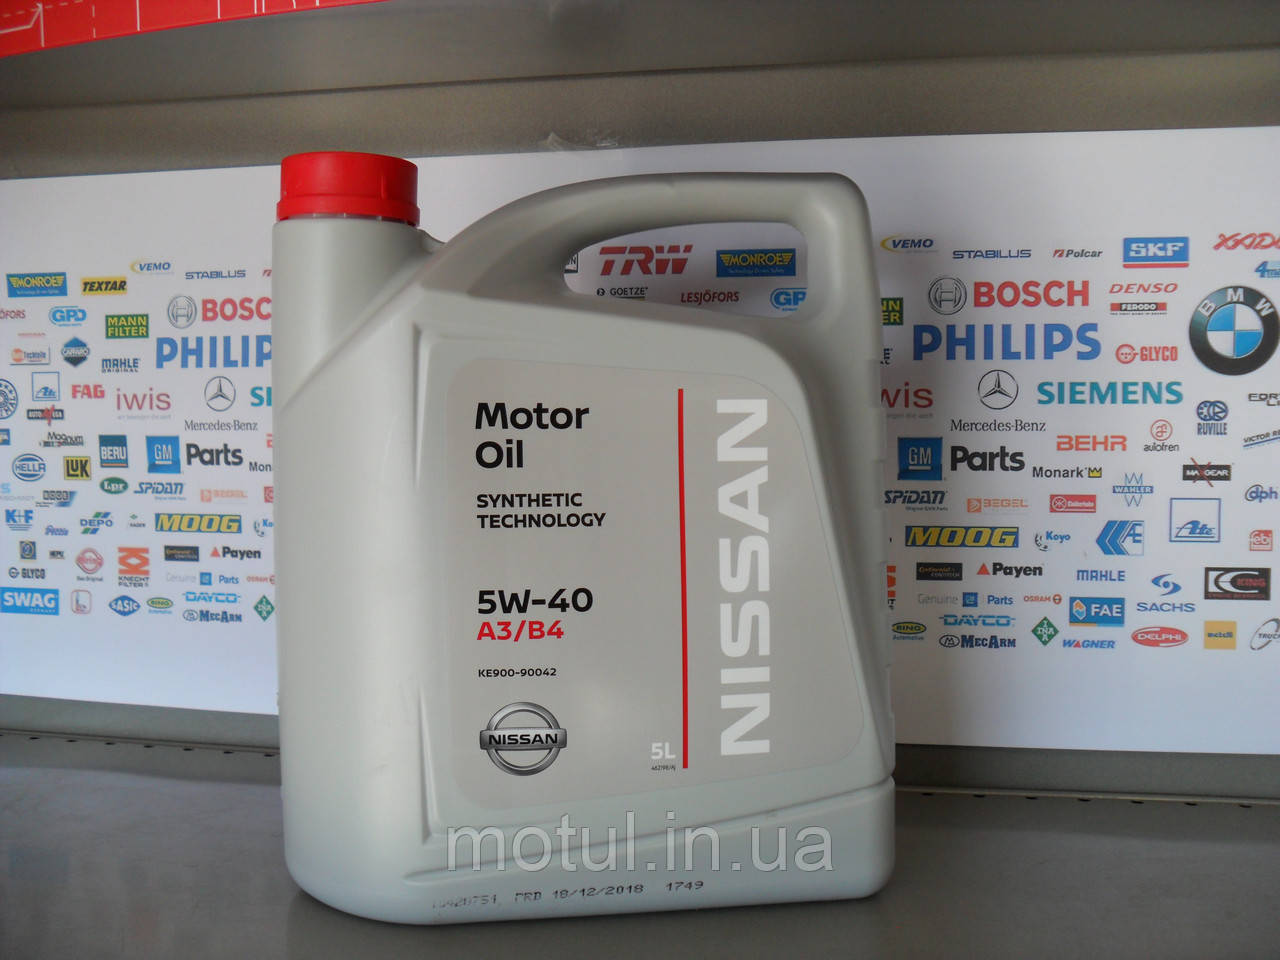 Моторное масло Nissan 5w40 5L